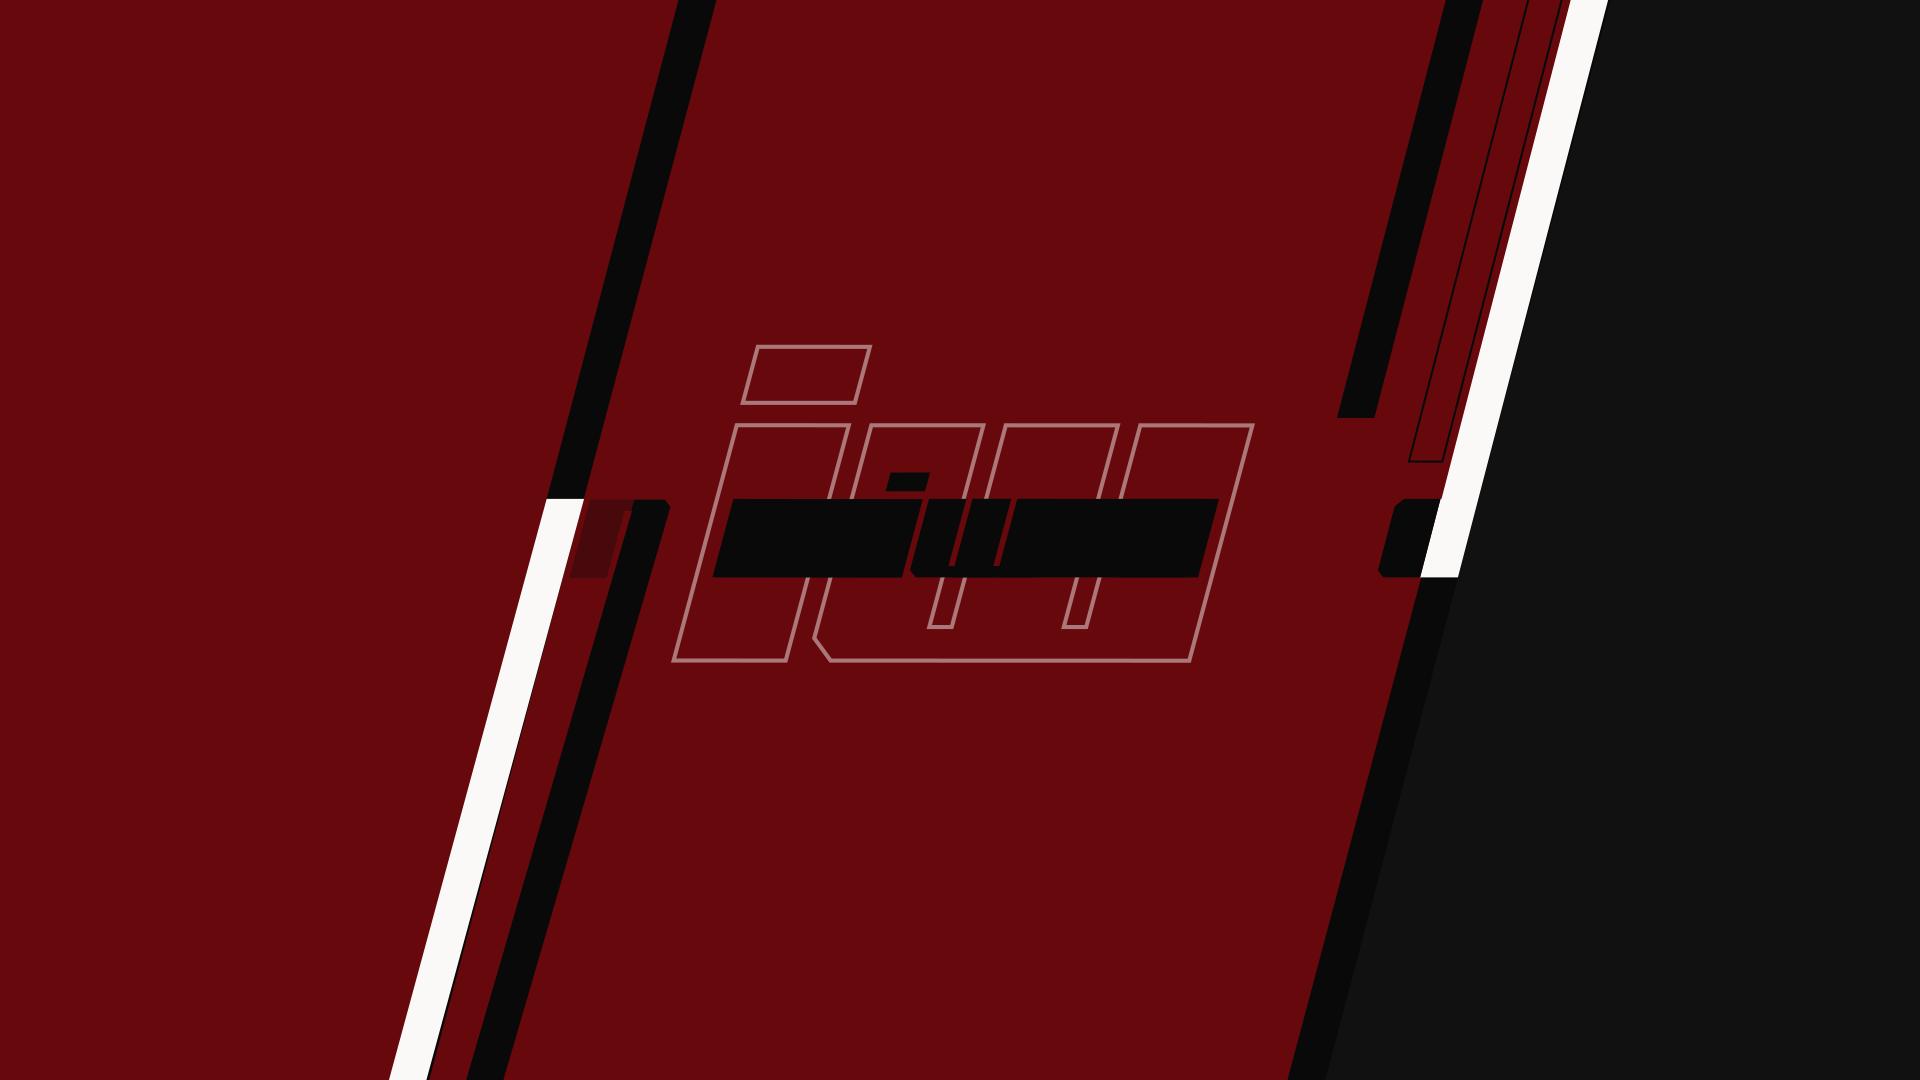 IW_StudioLogo_Anim_v006_00115.png